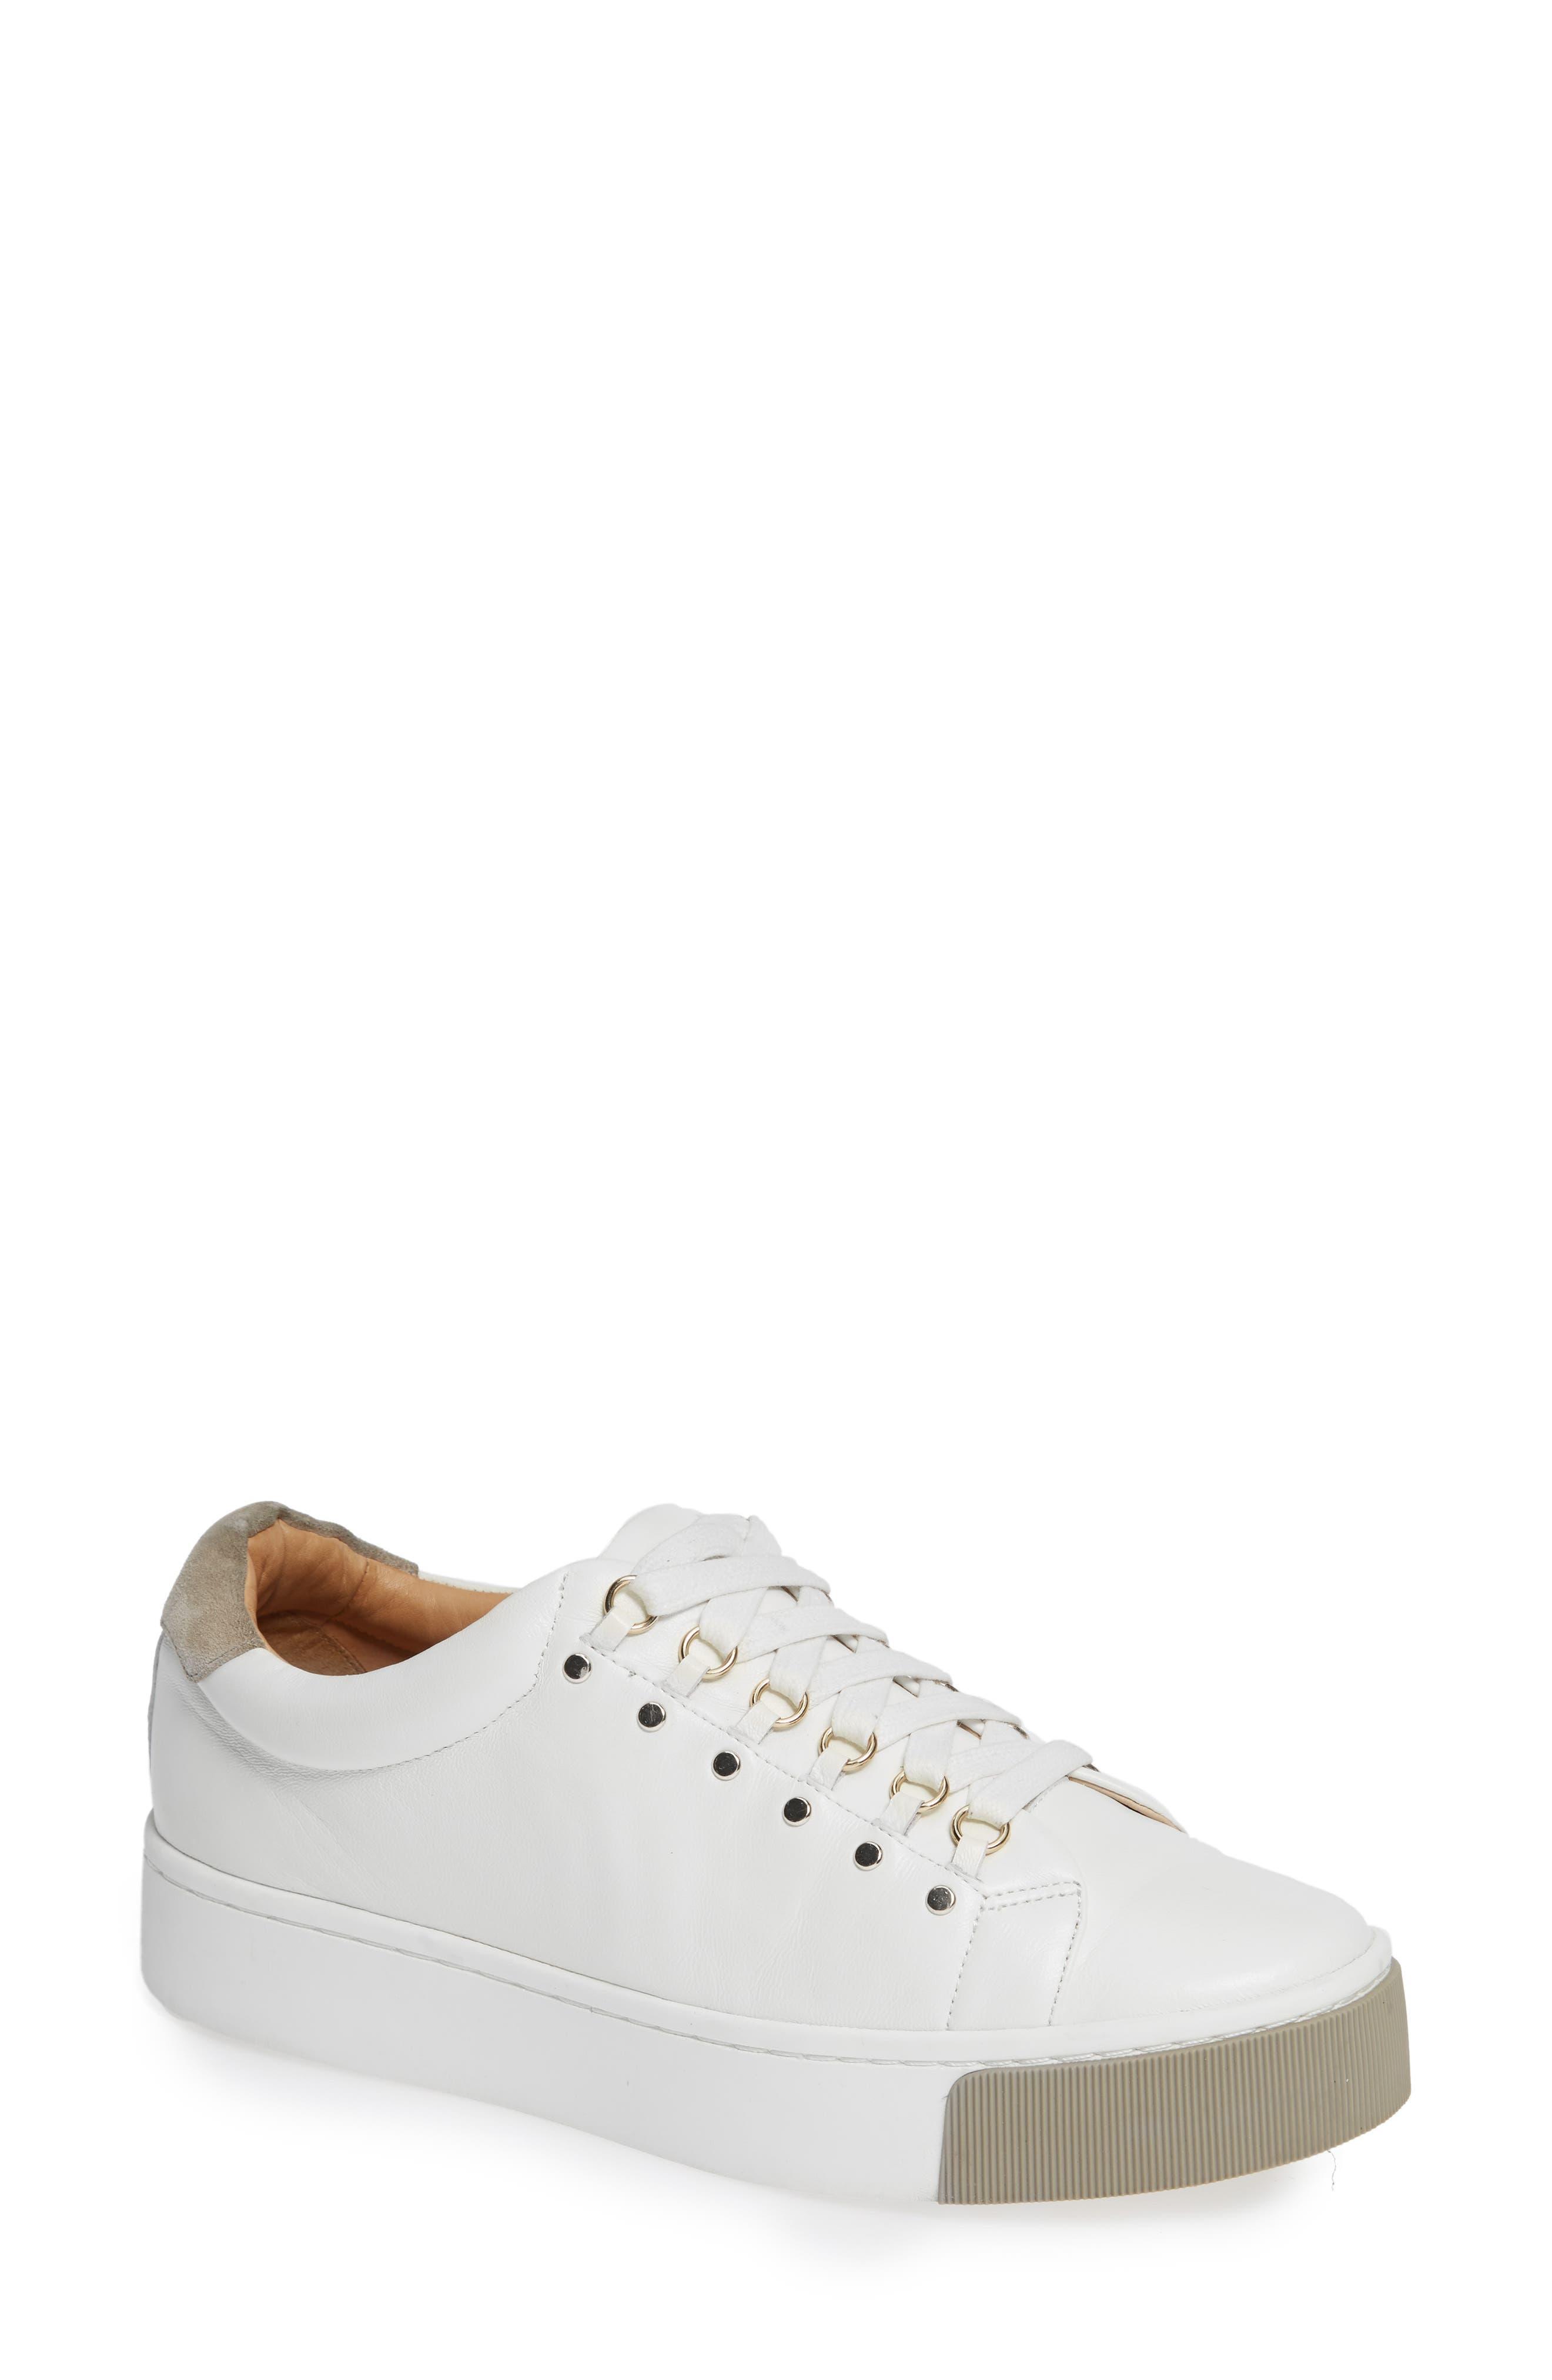 Handan Lace-Up Sneaker,                         Main,                         color, WHITE